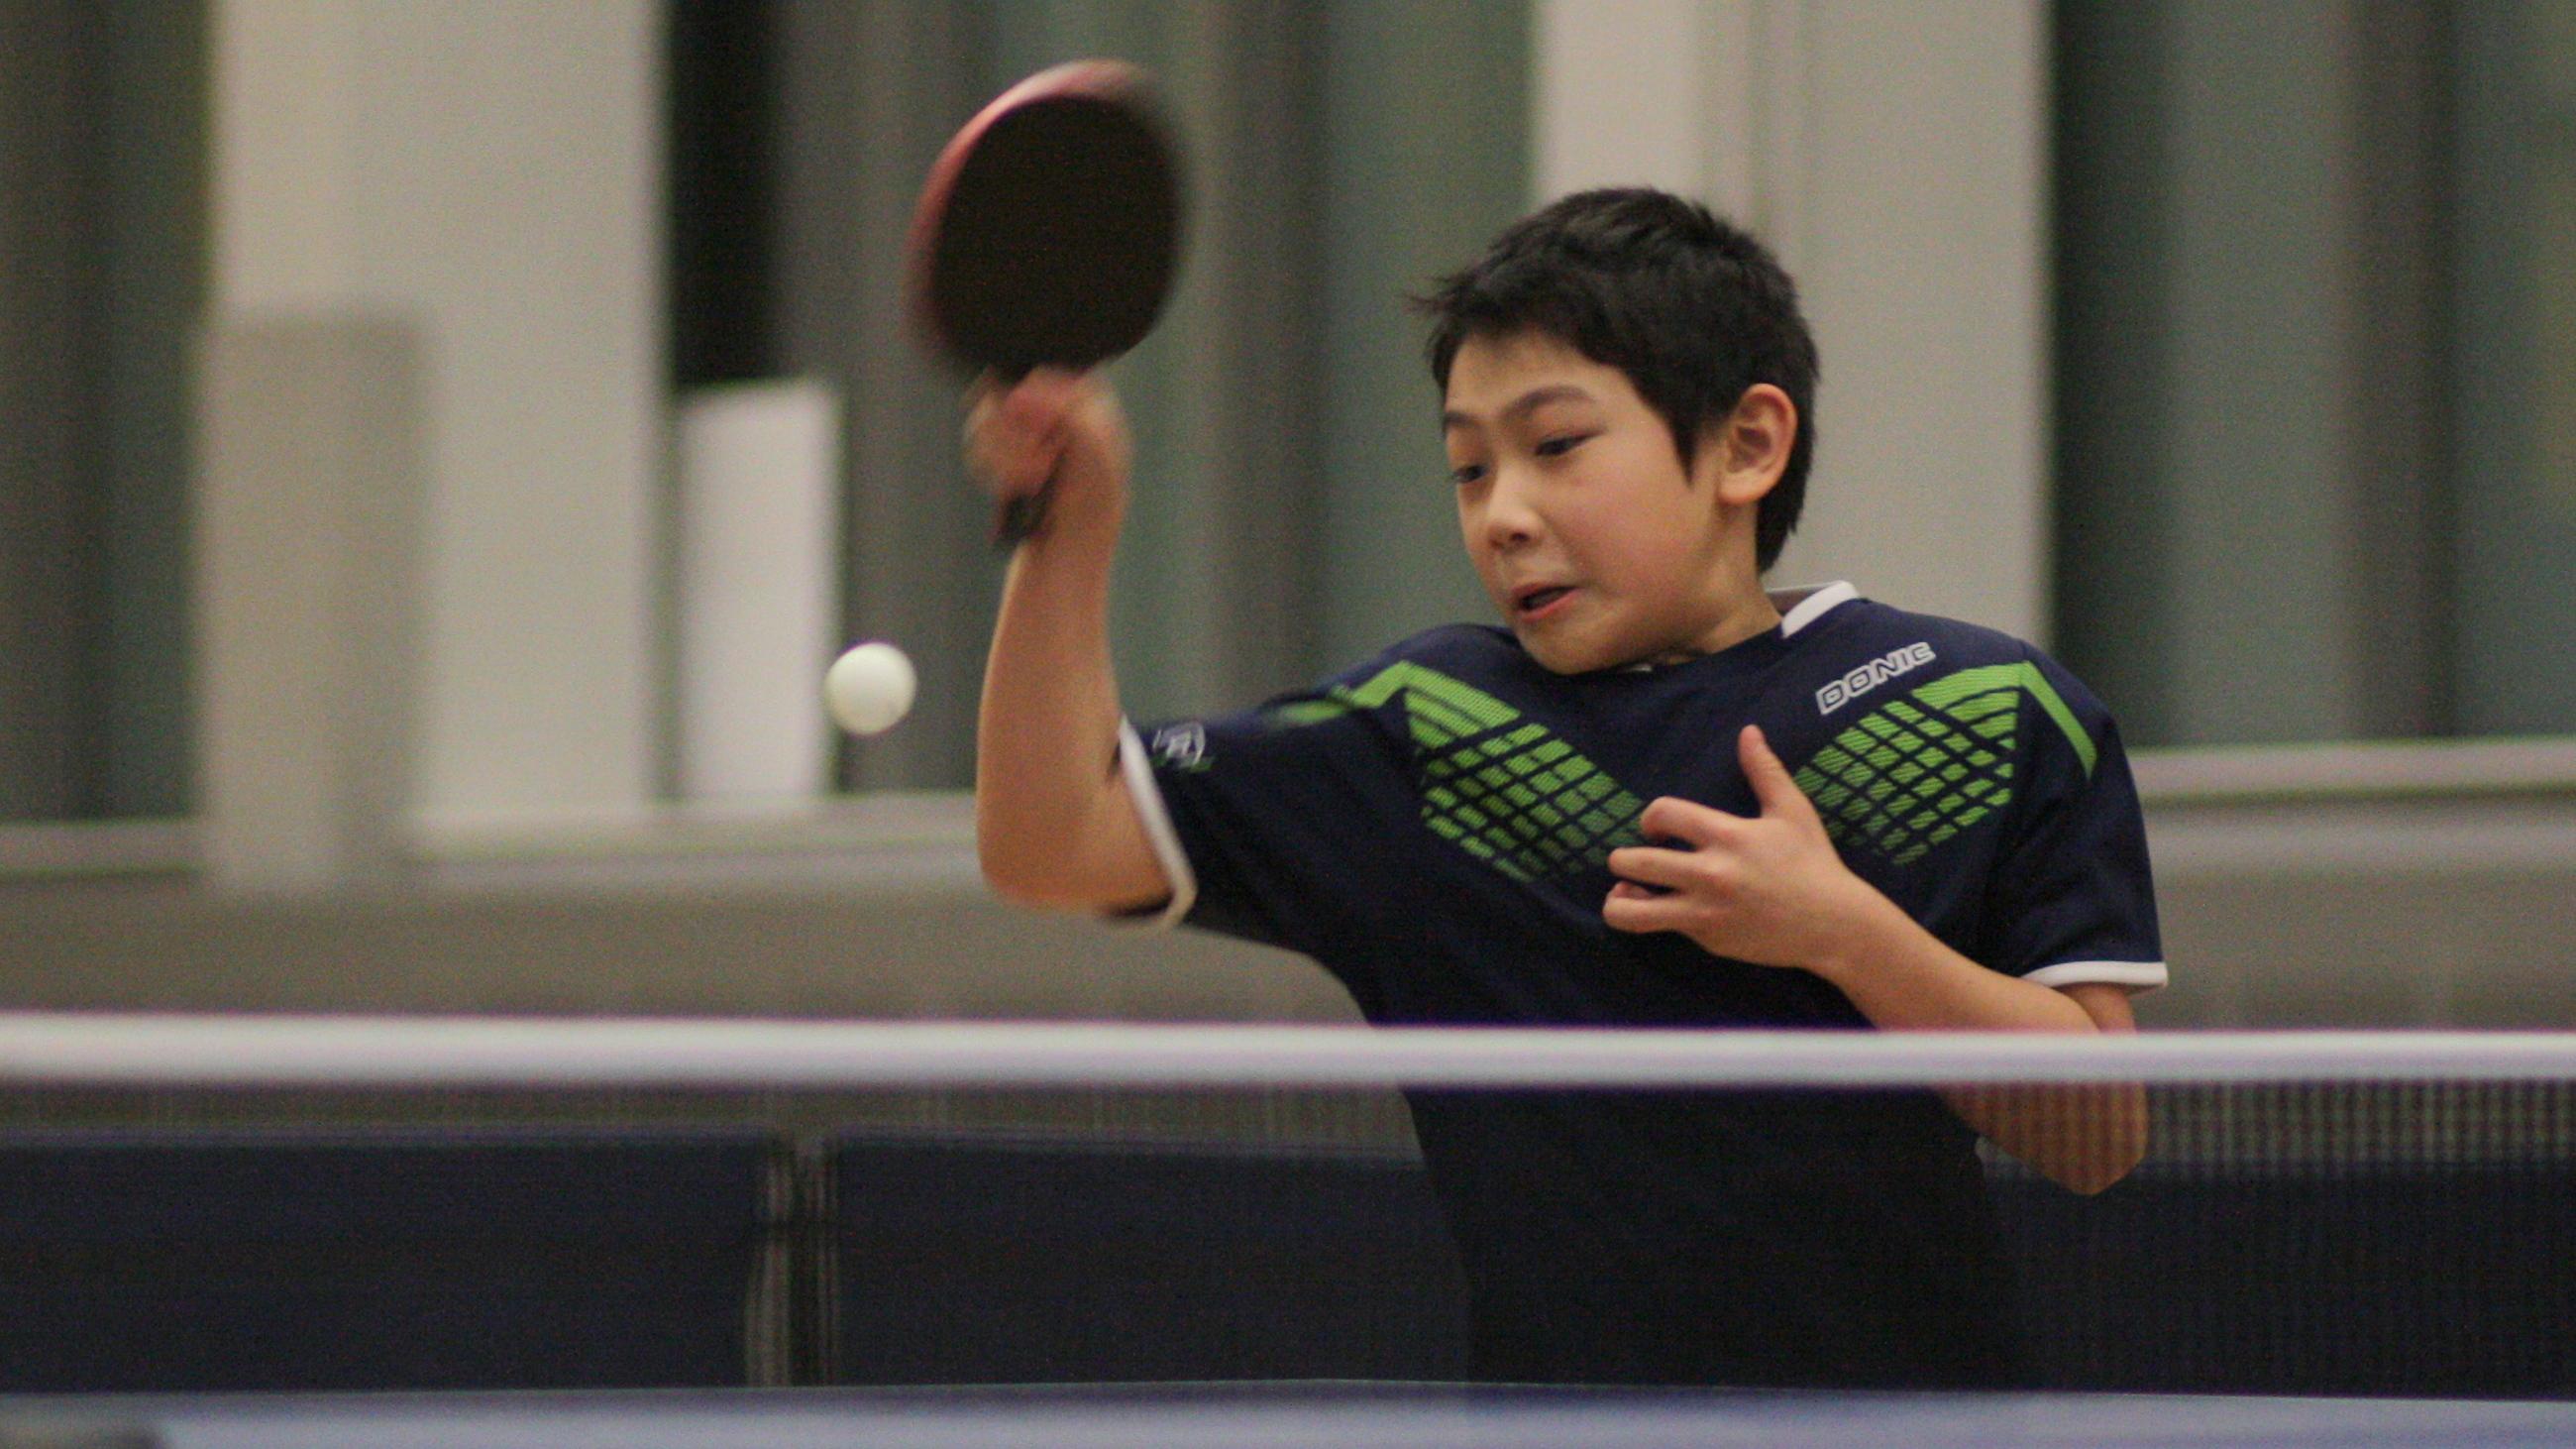 2. Platz Jugend: Jiayu (5:2 Spiele)